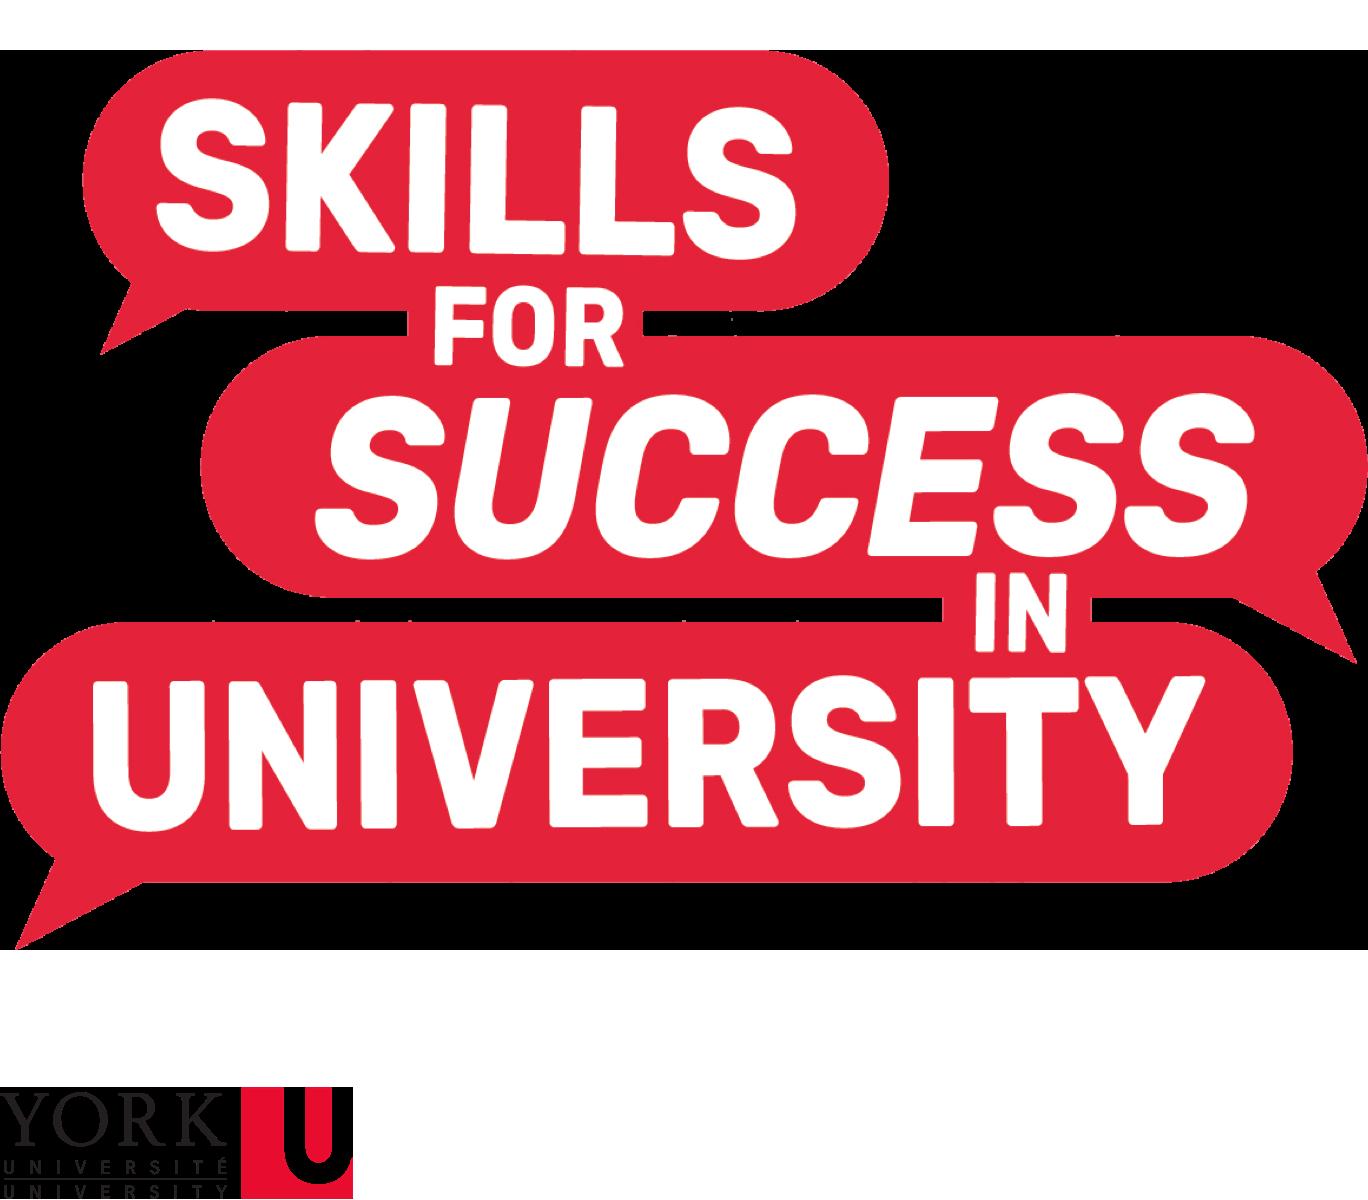 Skills for Success in University